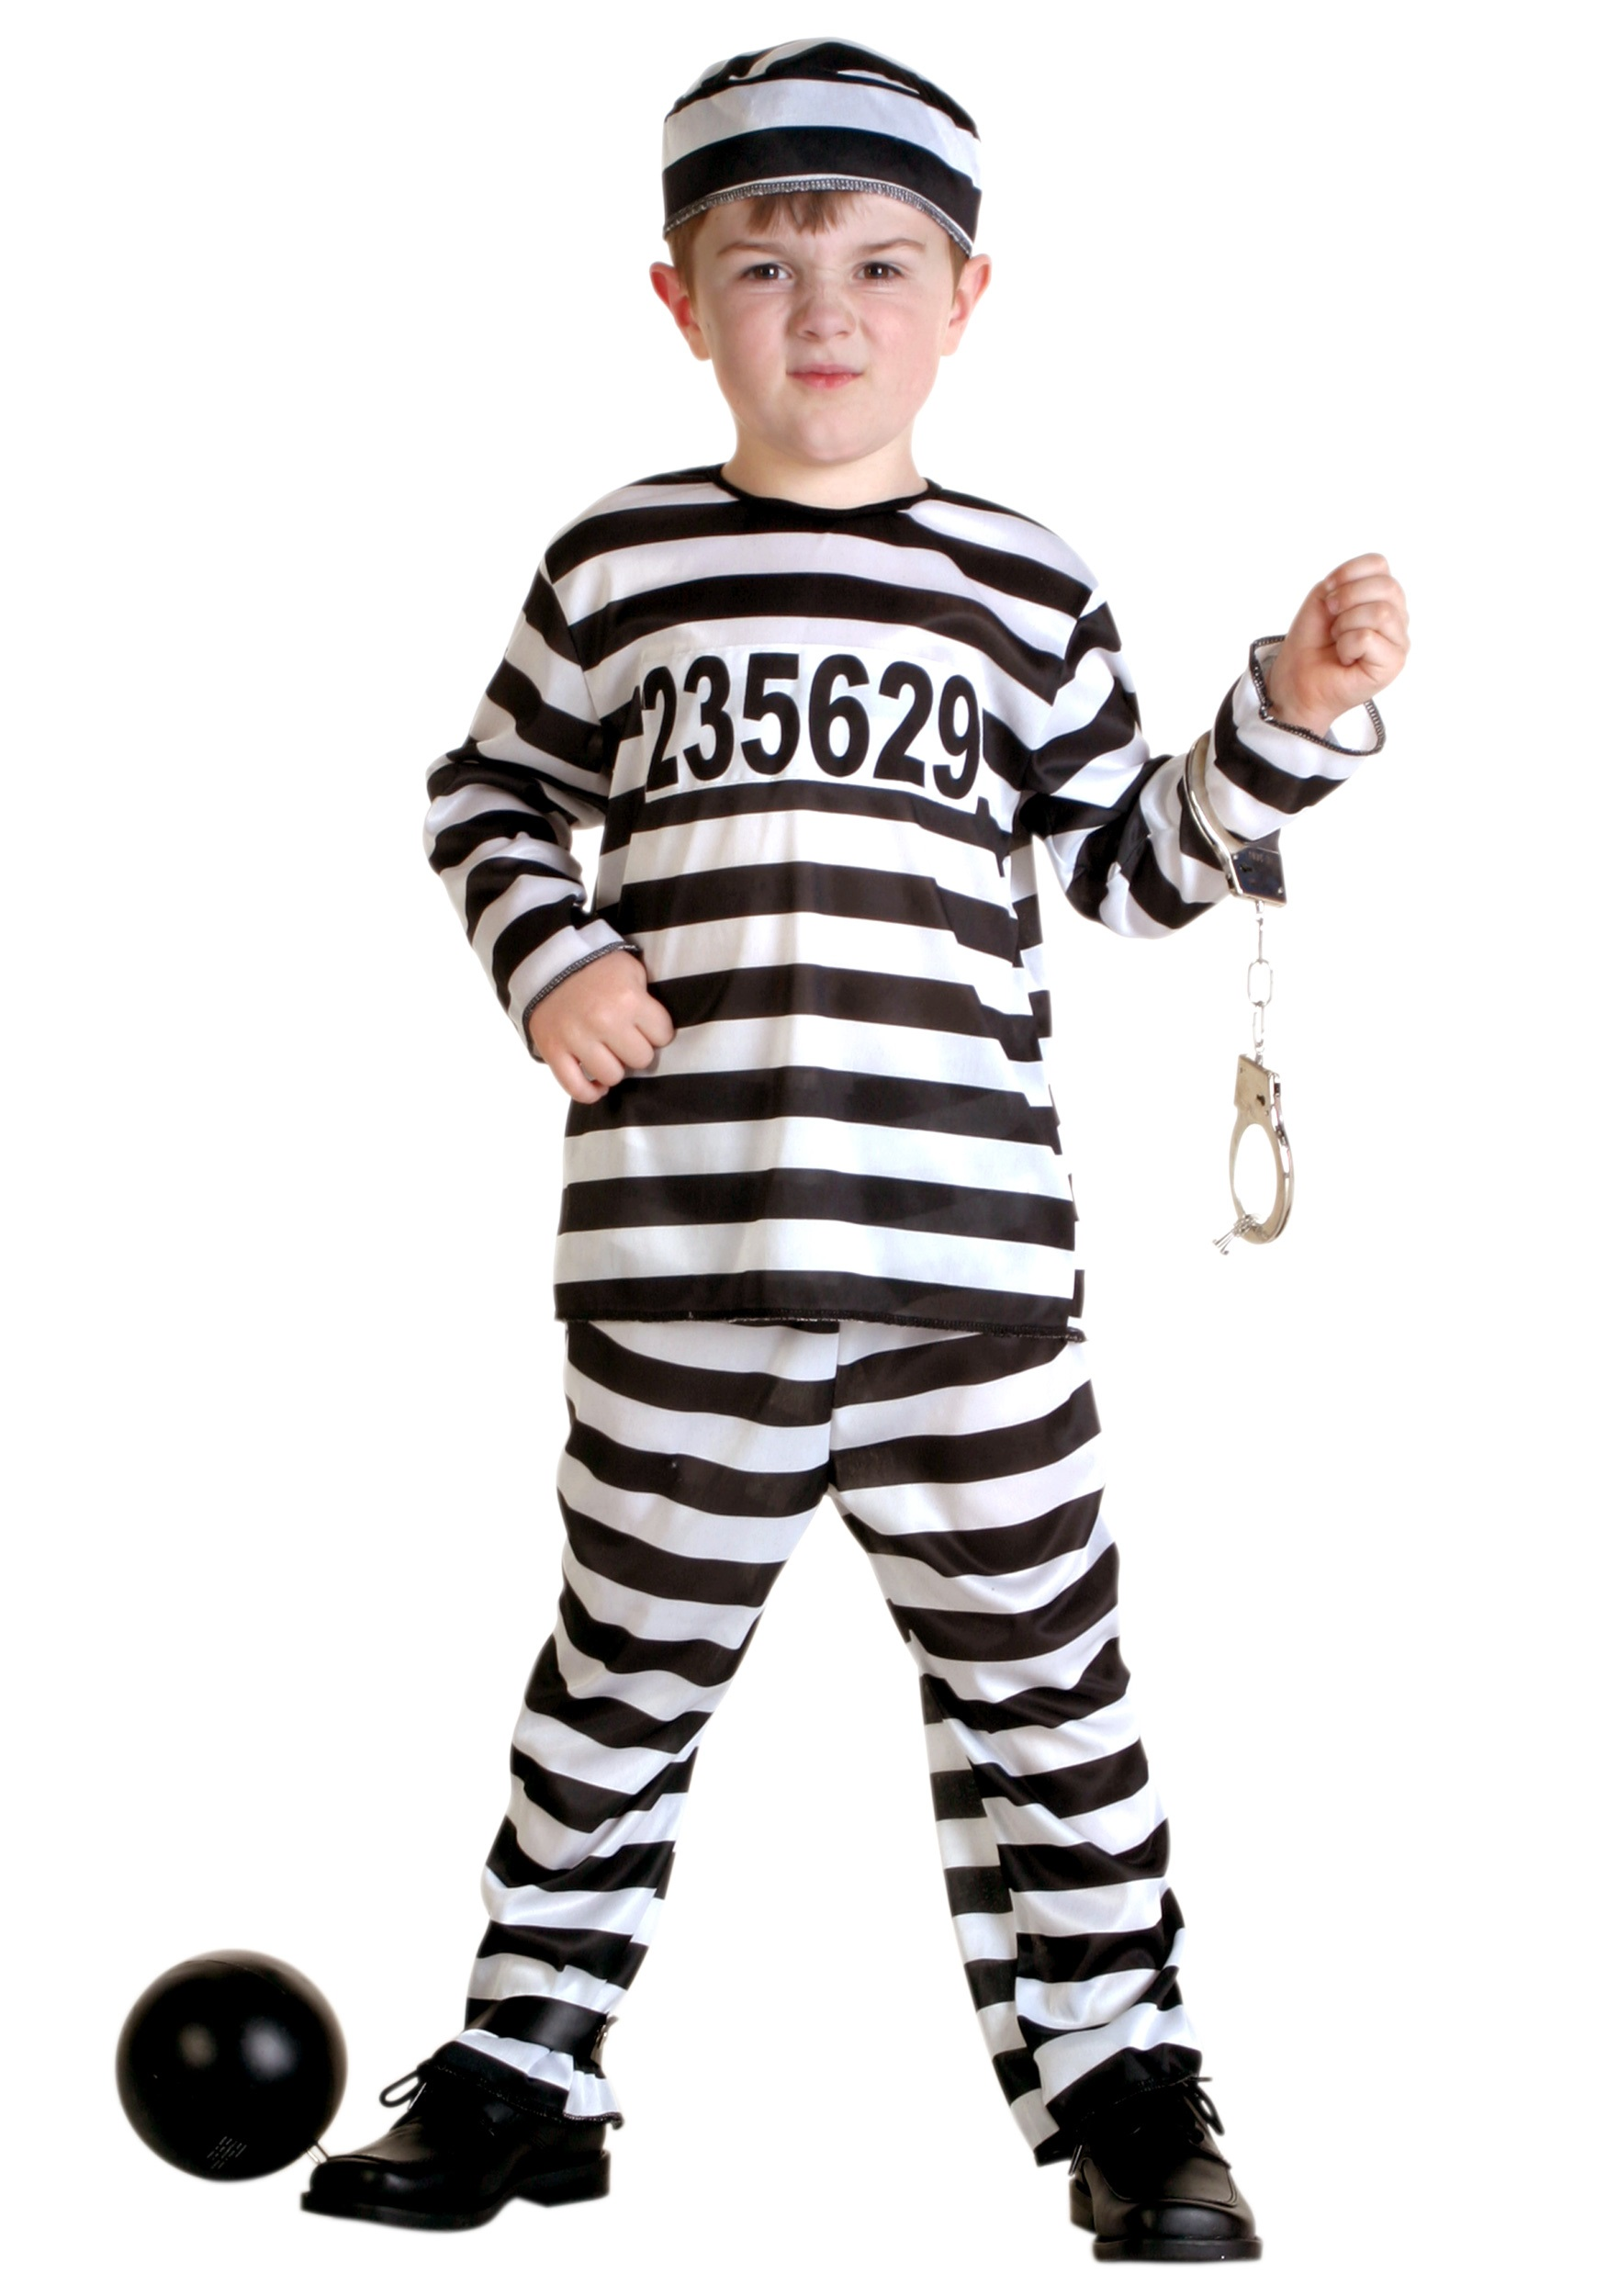 Toddler Prisoner Costume - Halloween Costume Ideas 2019